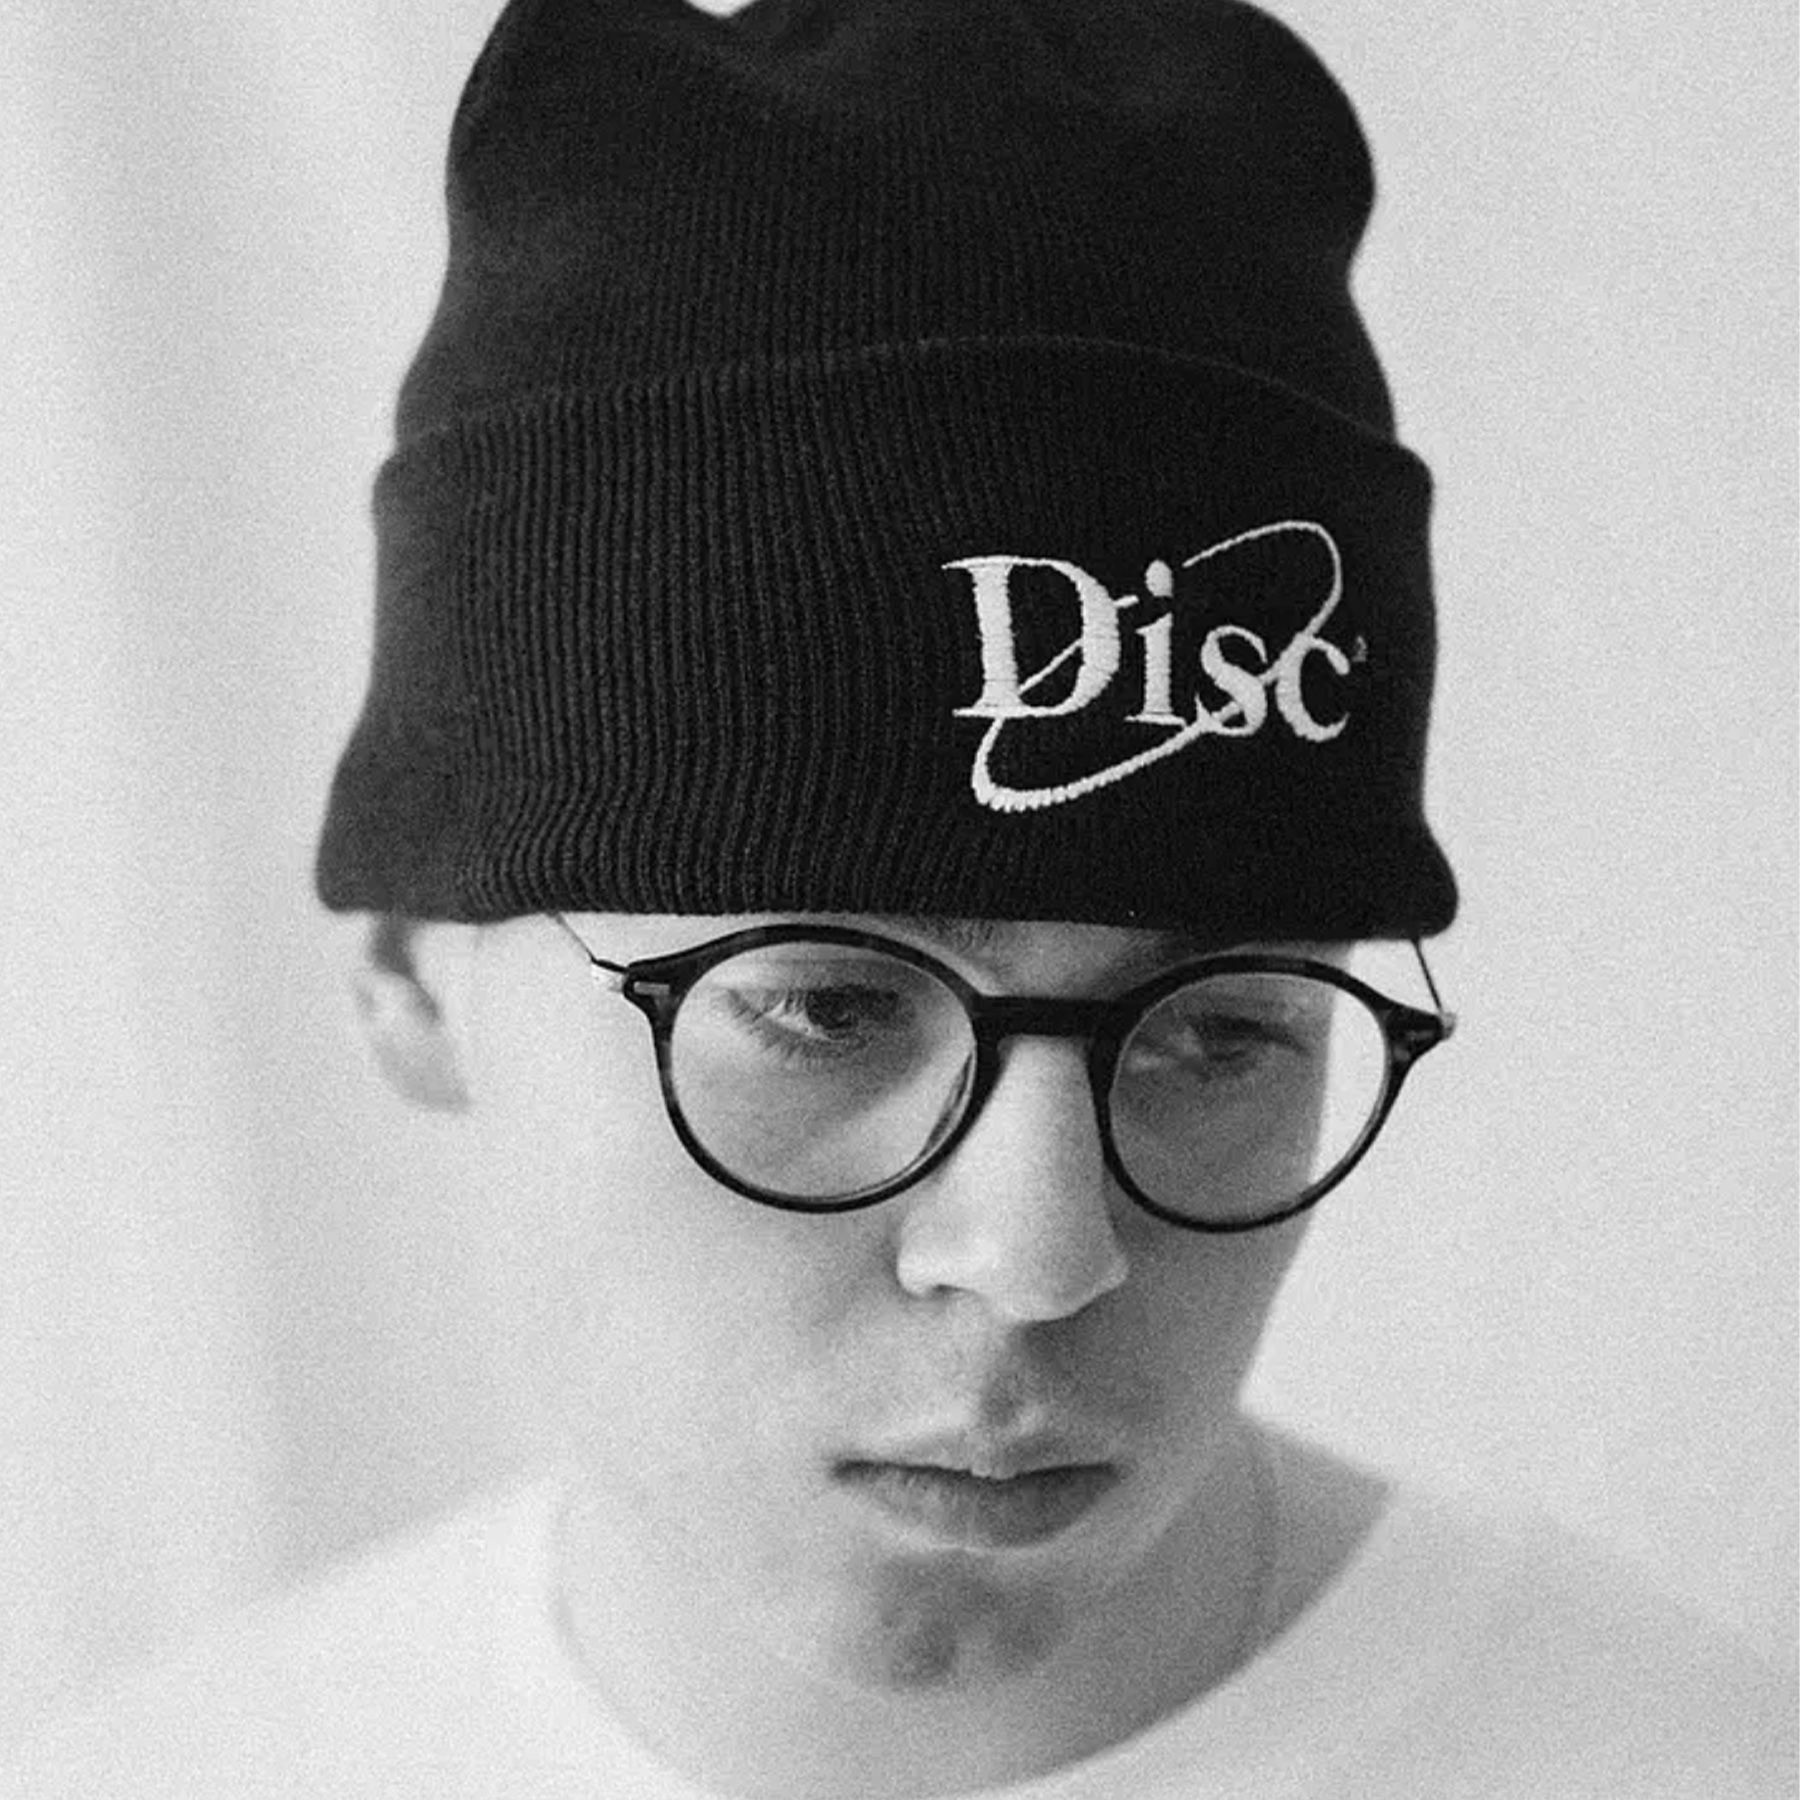 Disc.London